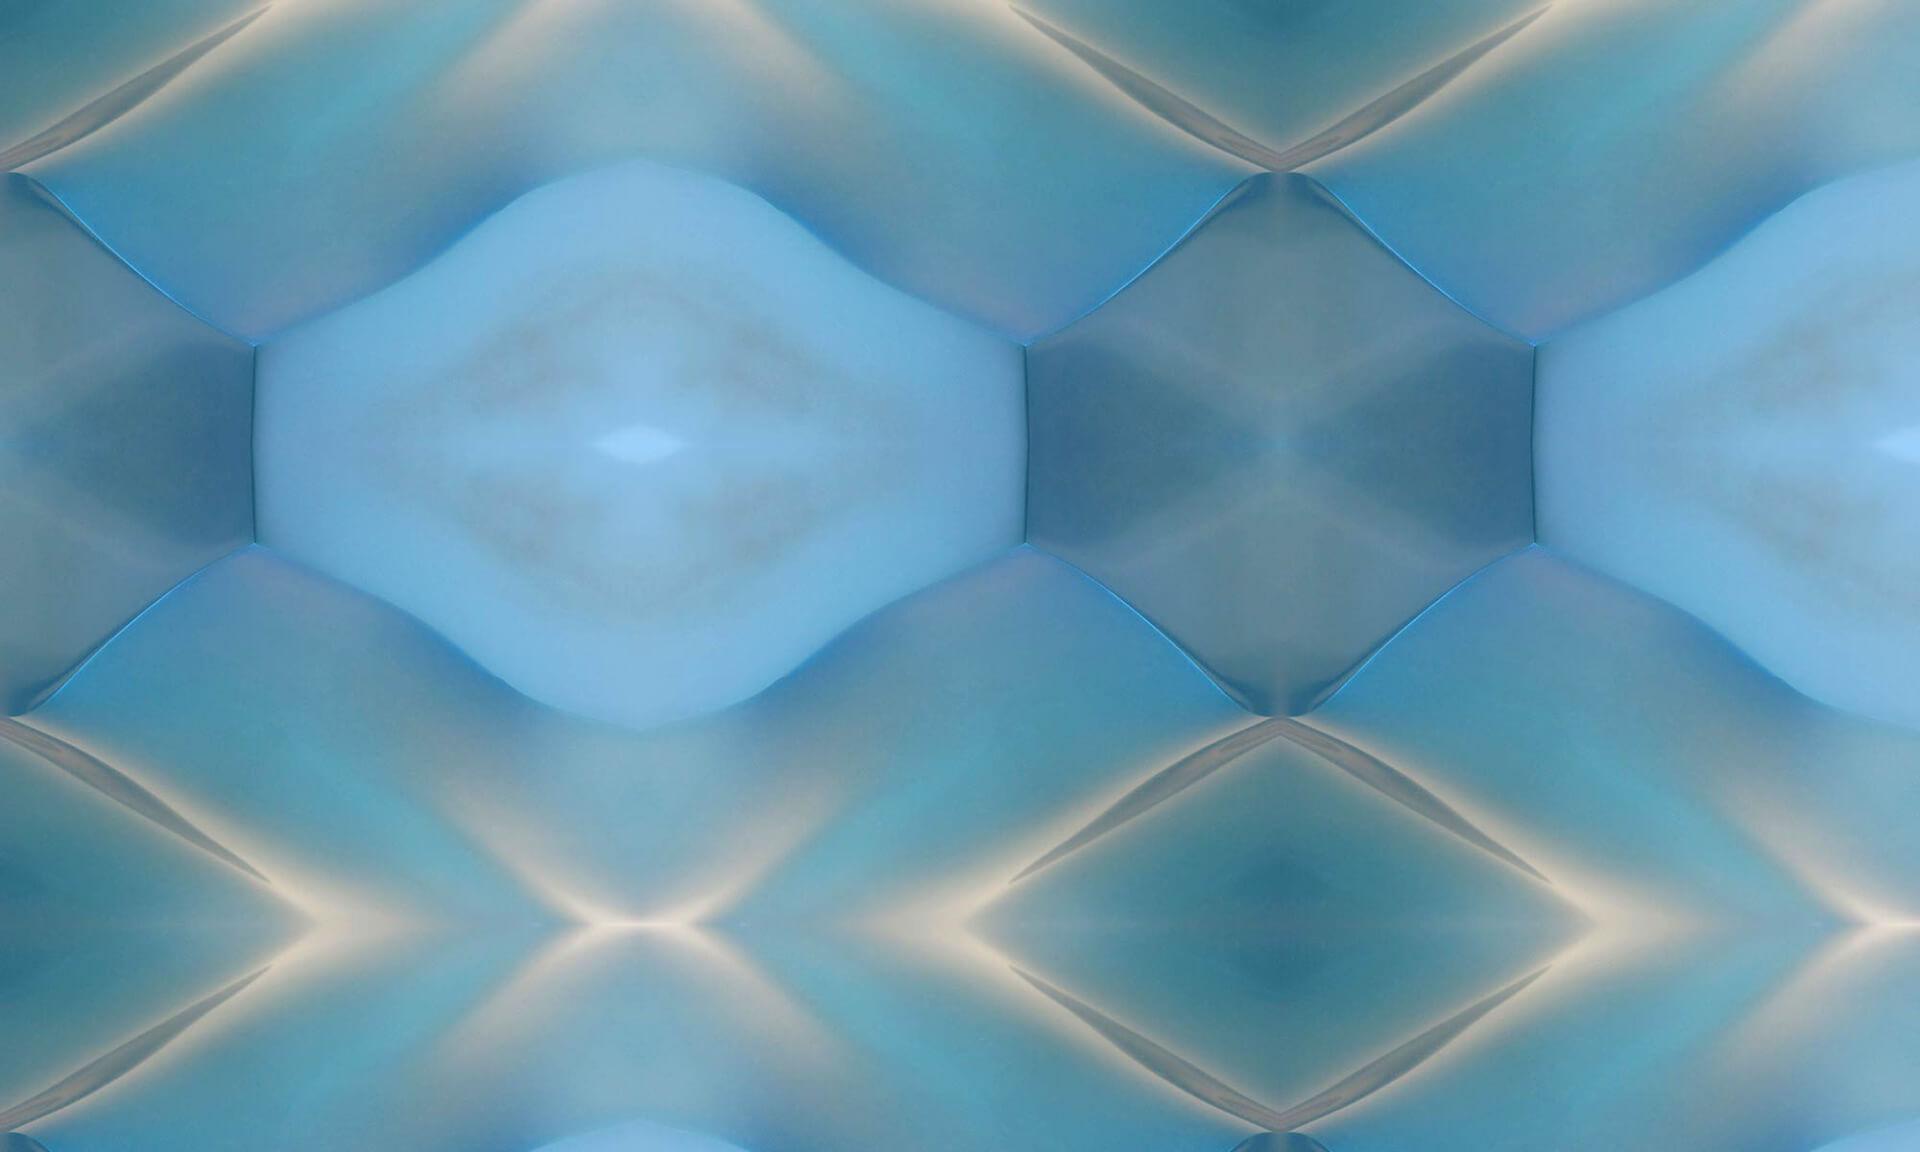 Geometric Wave MA0291 Doug Garrabrants